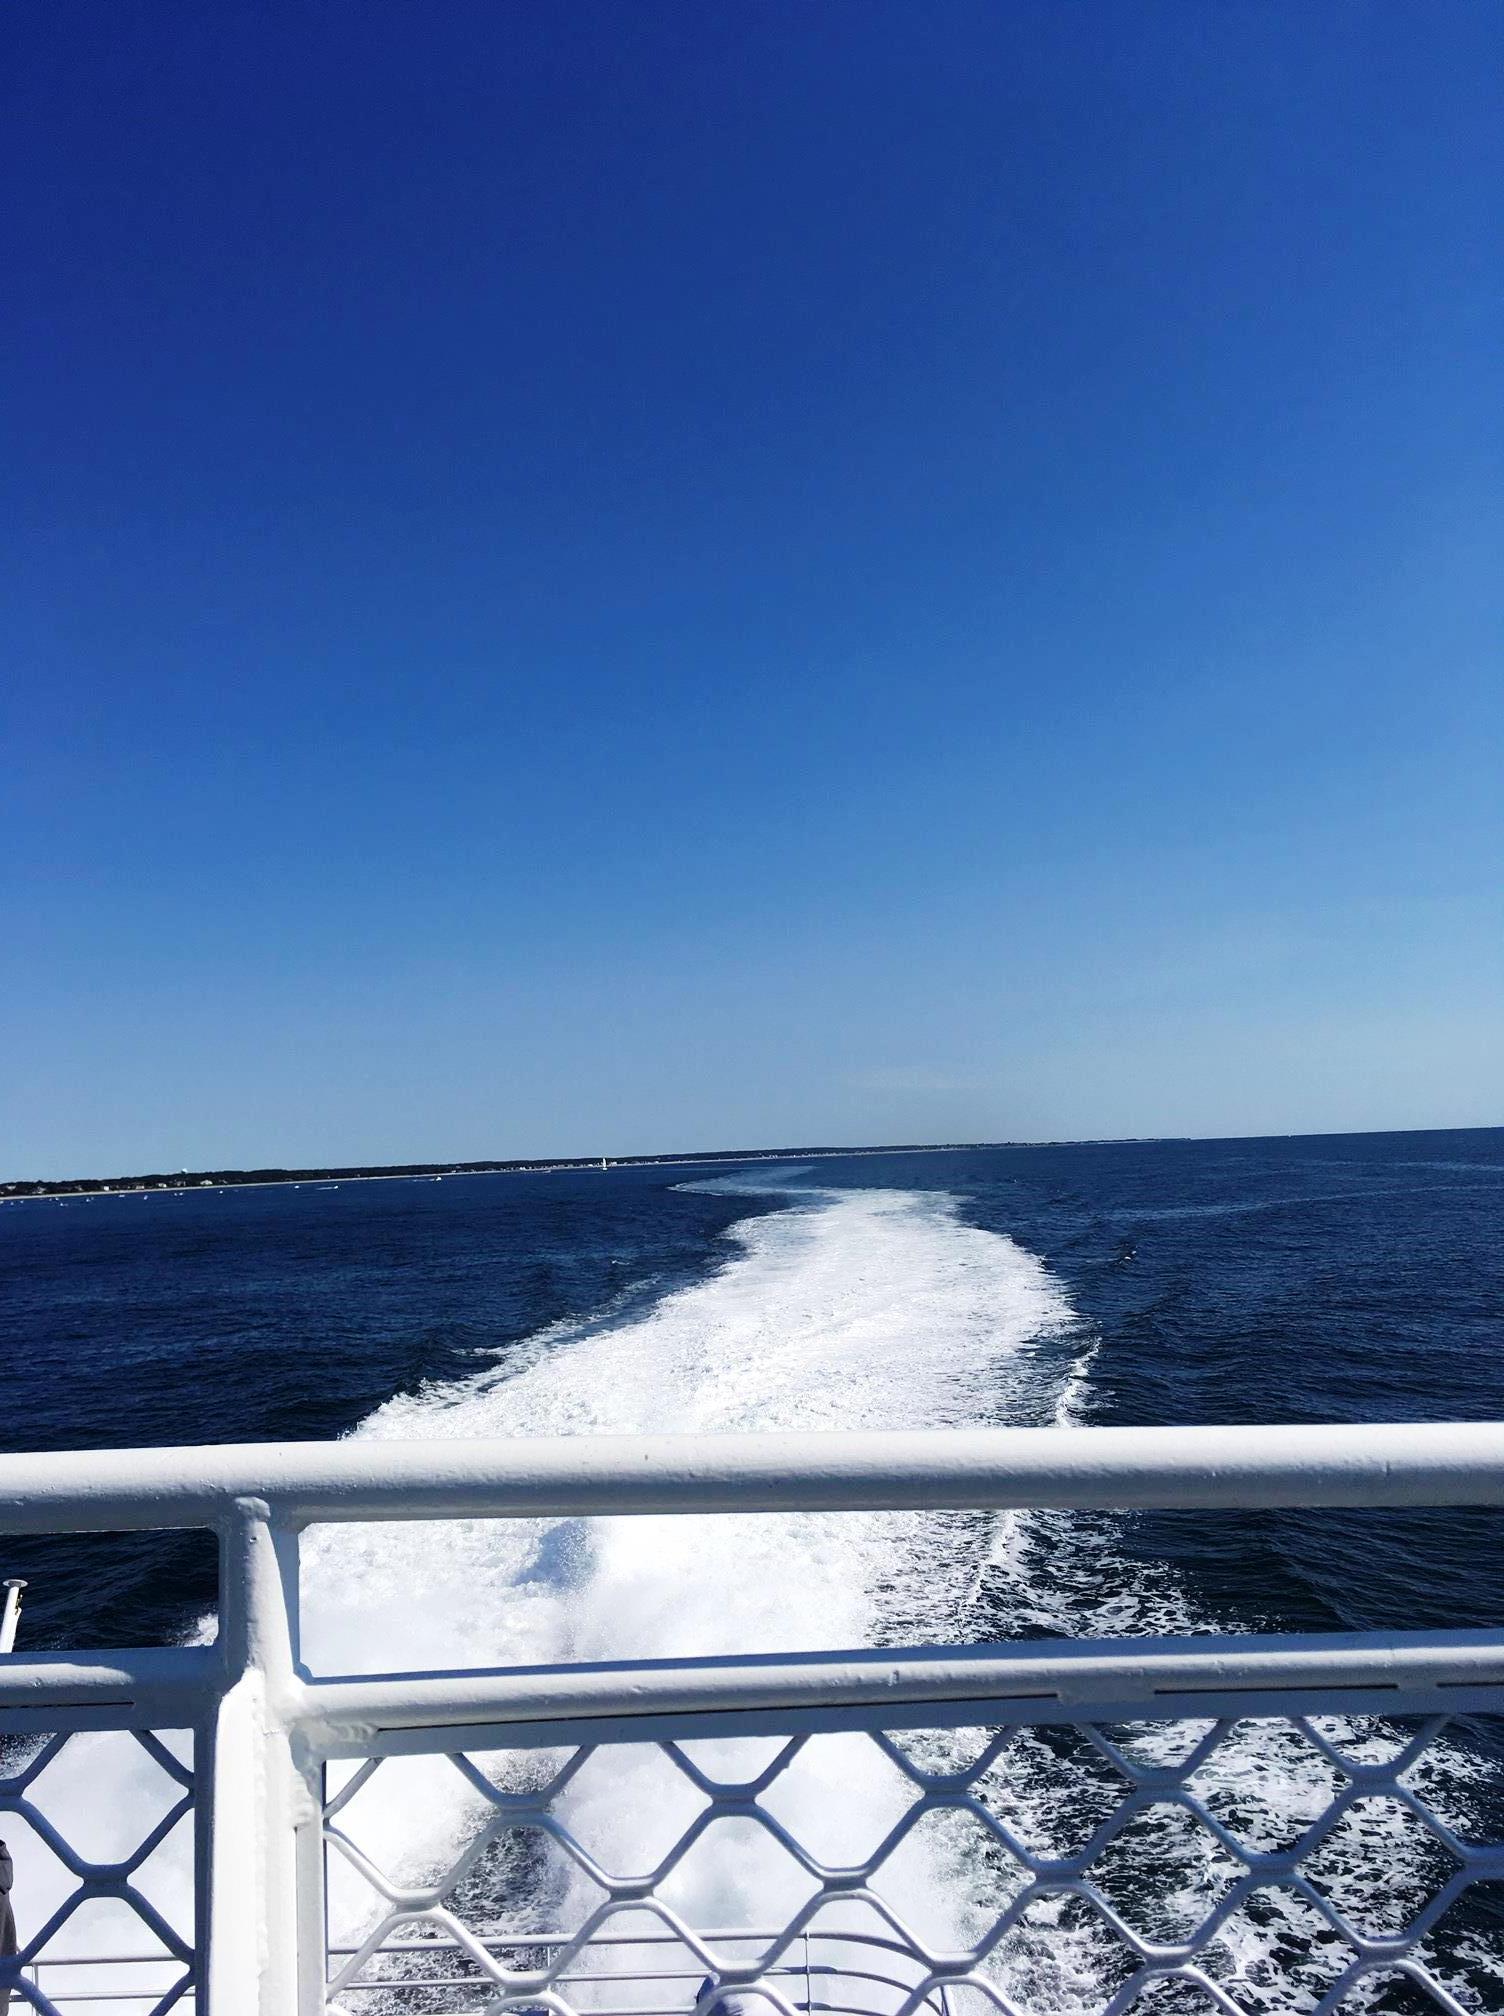 boat wake trail in ocean